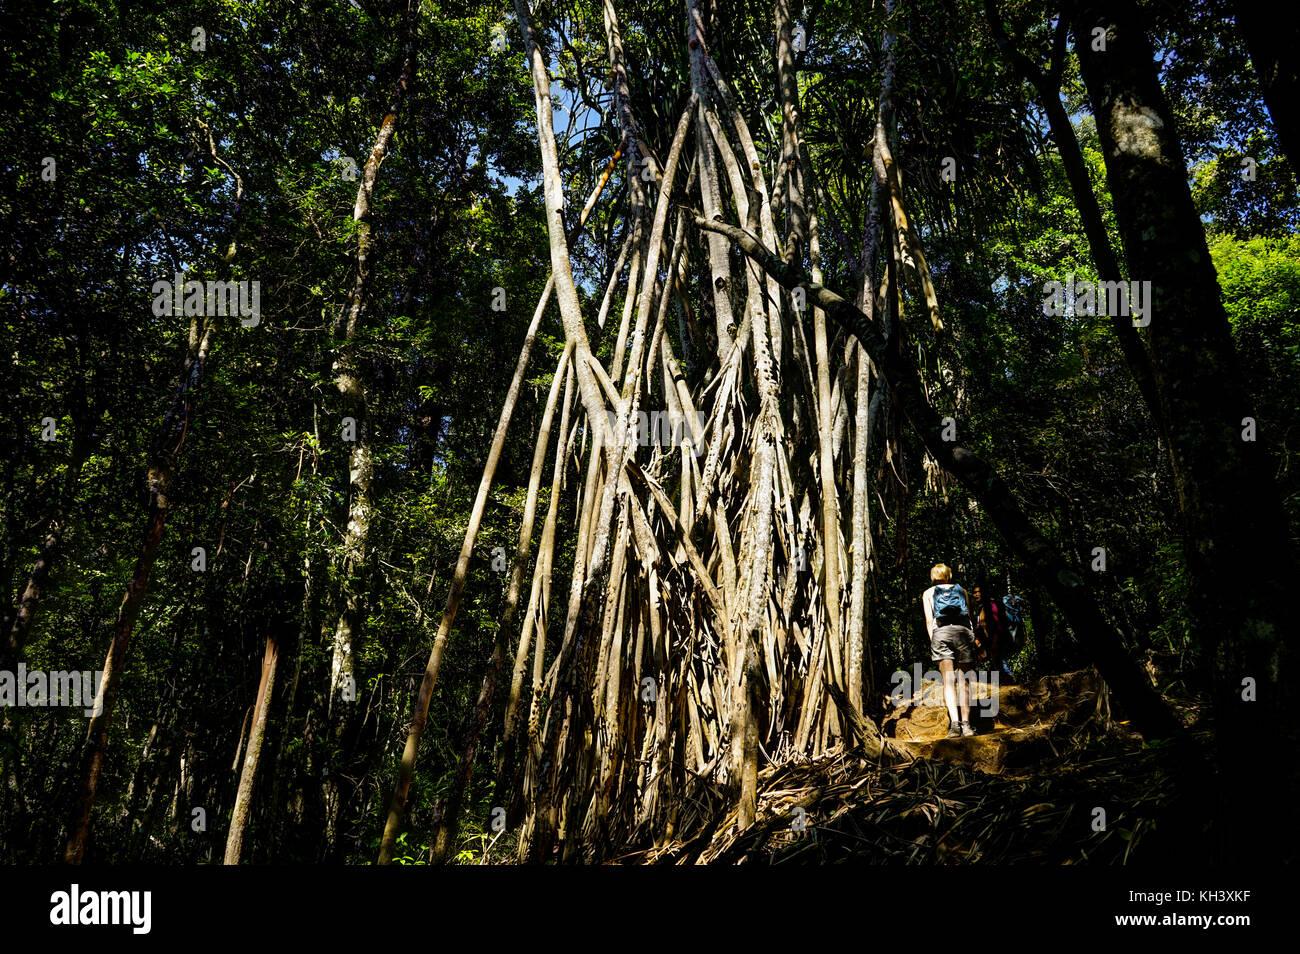 Forest grove Mount Rinjani Lombok Indonesia - Stock Image